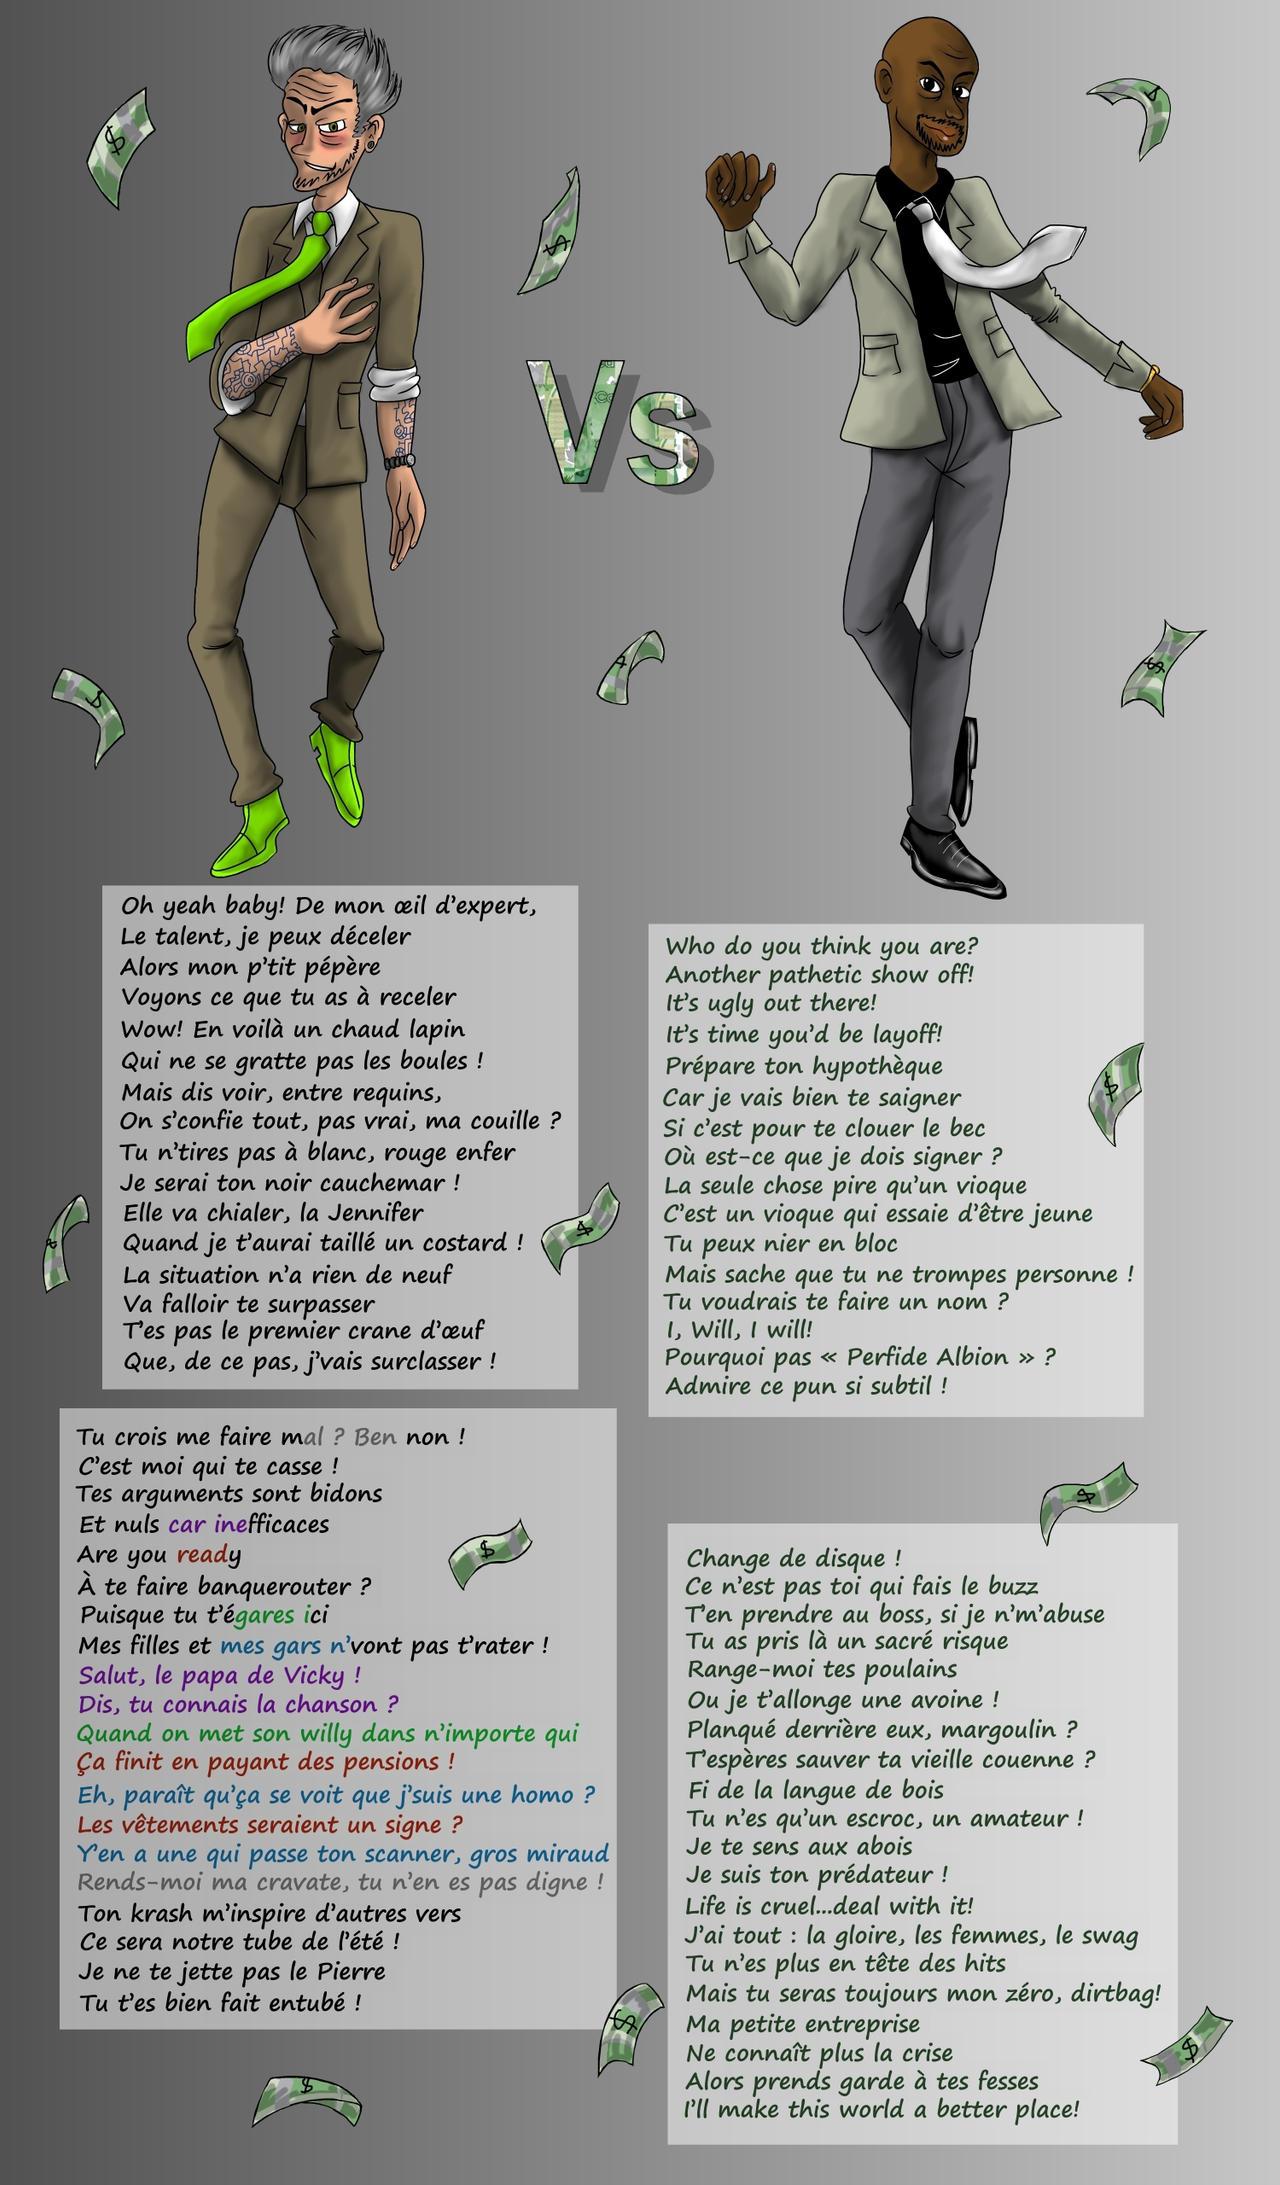 nombrils_rap_battle___le_producteur_vs_will_by_campanita42_ddykpcx-fullview.jpg?token=eyJ0eXAiOiJKV1QiLCJhbGciOiJIUzI1NiJ9.eyJzdWIiOiJ1cm46YXBwOiIsImlzcyI6InVybjphcHA6Iiwib2JqIjpbW3siaGVpZ2h0IjoiPD0yMTg1IiwicGF0aCI6IlwvZlwvZDRmNWJkNDQtZTFjNC00MjA0LTk3NTEtNGRiNDgzMjdjYzY5XC9kZHlrcGN4LWJmMjZiNmIwLTZiNDUtNGZhNi1hZmJmLWEwYzFkNmFhYTVhMi5qcGciLCJ3aWR0aCI6Ijw9MTI4MCJ9XV0sImF1ZCI6WyJ1cm46c2VydmljZTppbWFnZS5vcGVyYXRpb25zIl19.blg70B26f-KLoDM6tsg1qEs30ByN3zzQnrs6hKxHr5U